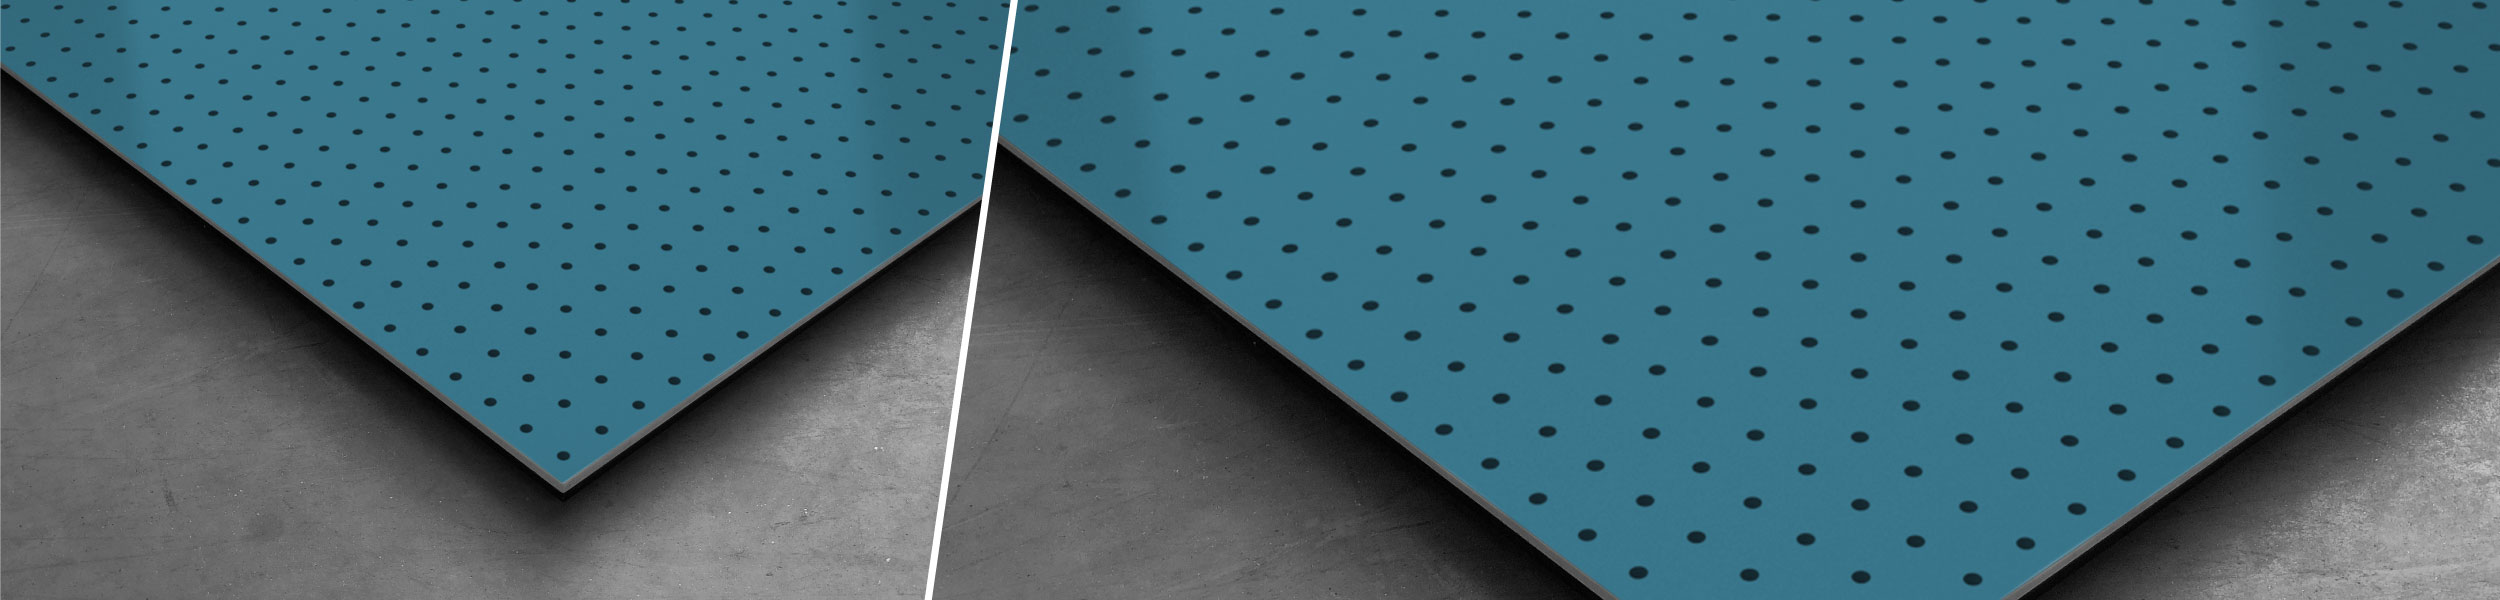 Artnovion product norma 8 cl panelling 69f861d510